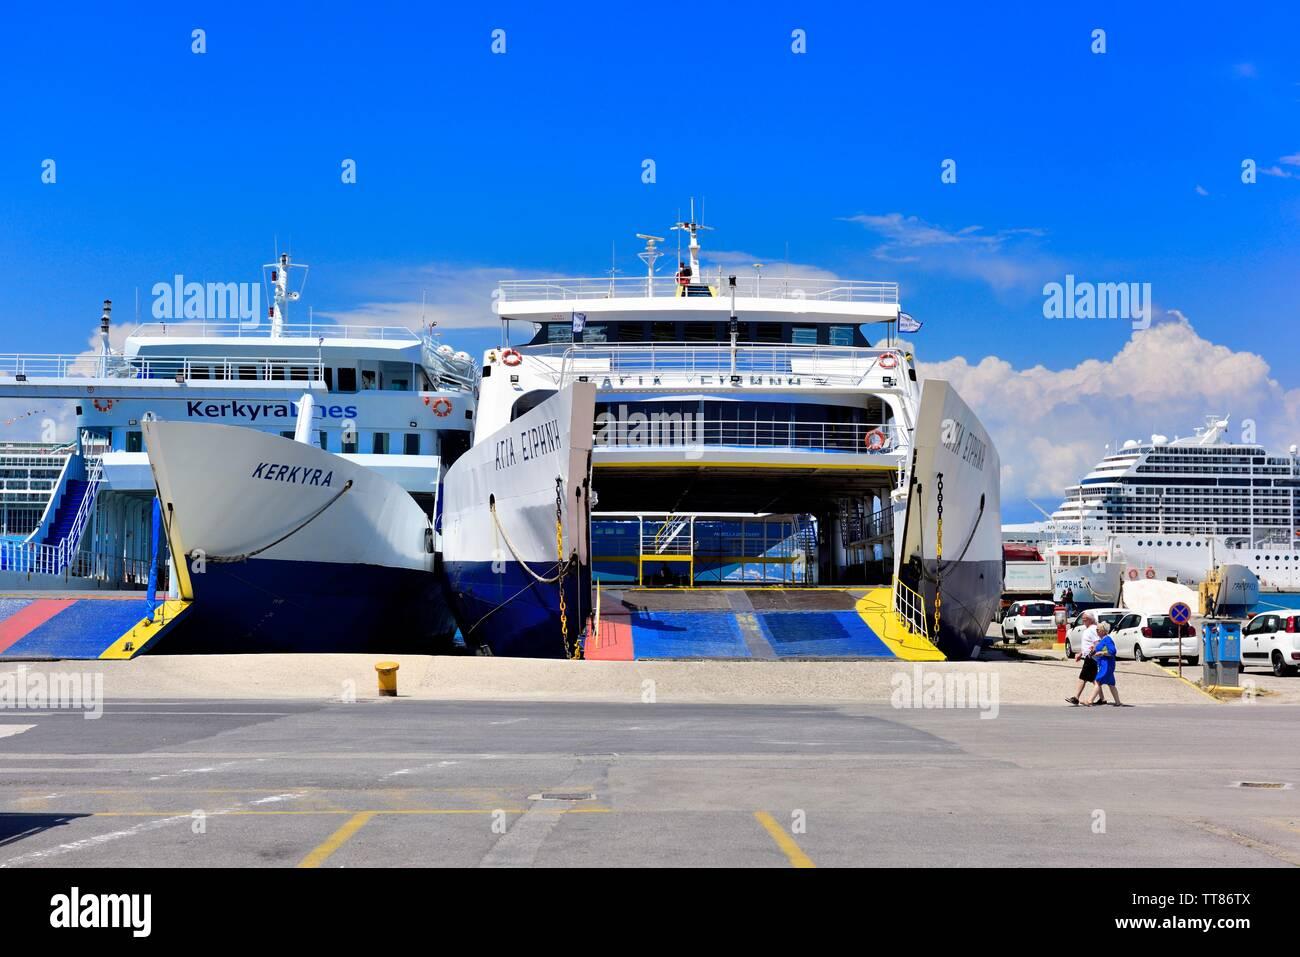 Corfu new port,car ferries waiting to load,Kerkyra,ionian islands,Greece Stock Photo